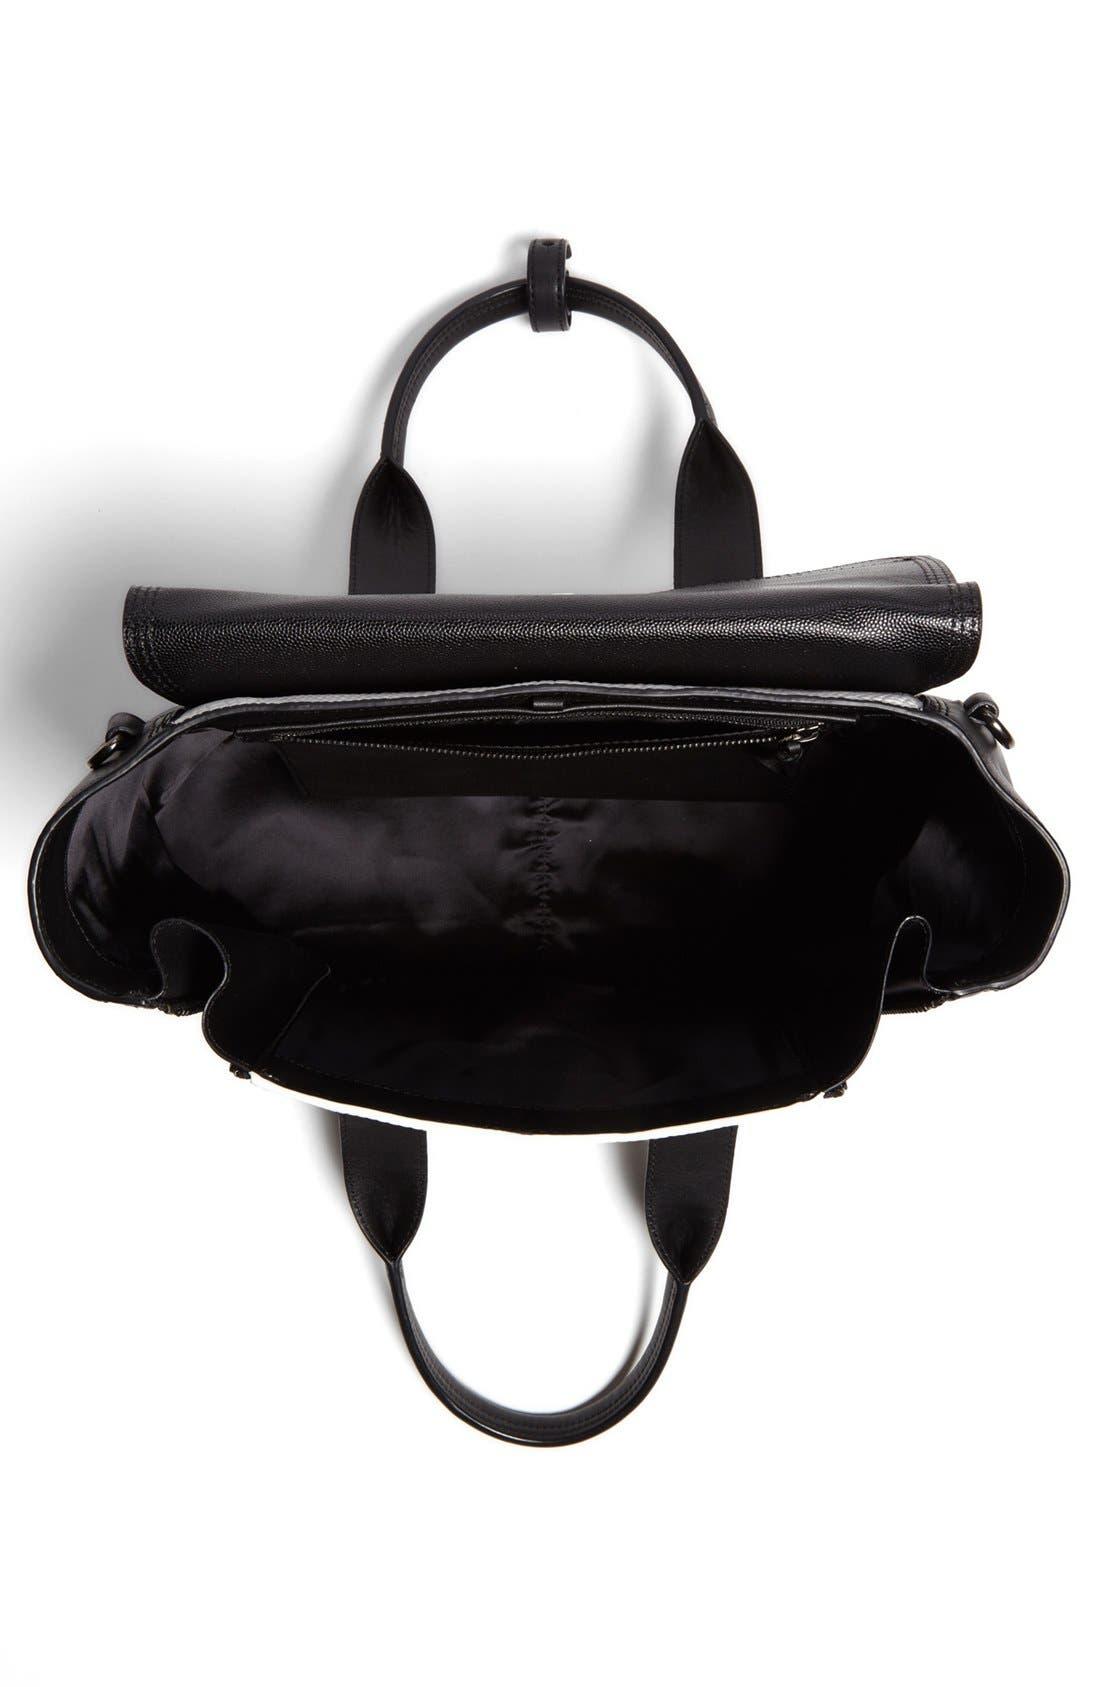 Alternate Image 2  - 3.1 Phillip Lim 'Medium Pashli' Leather Satchel